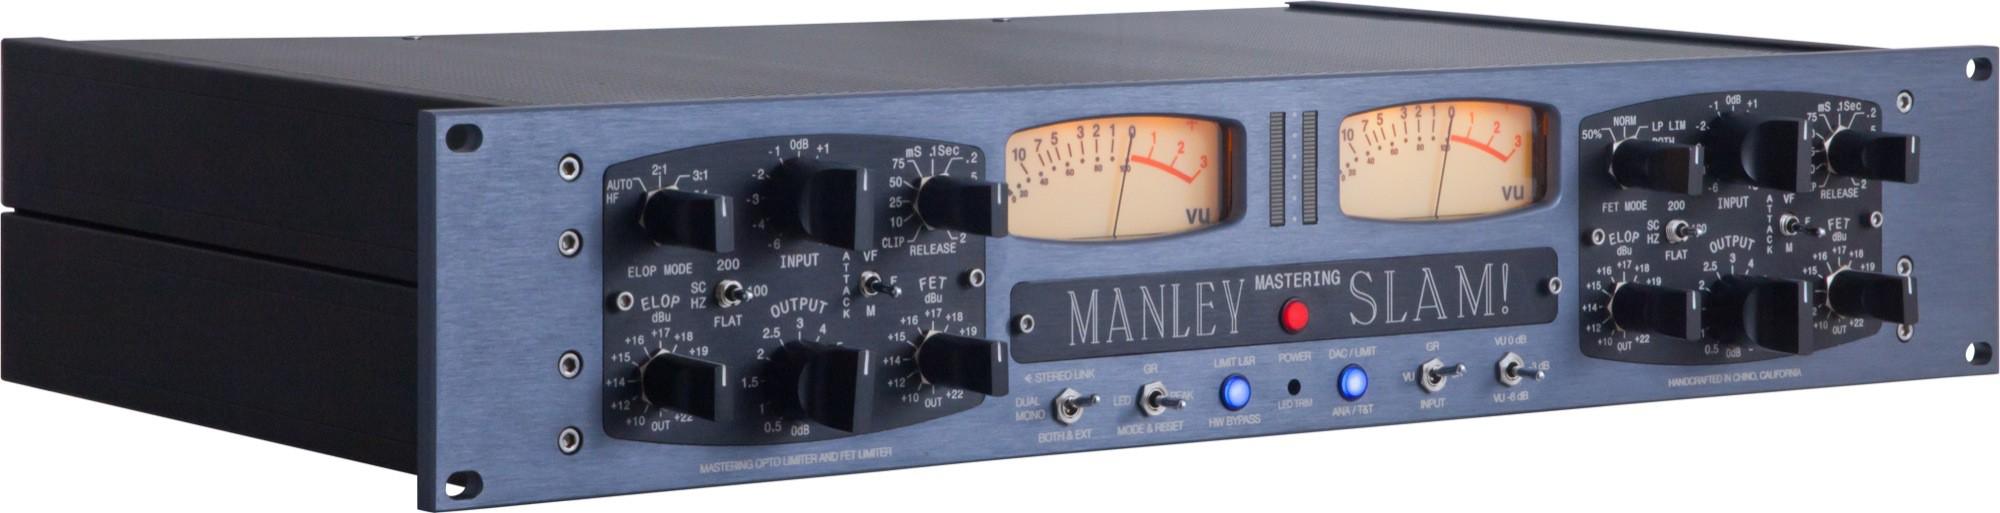 Manley SLAM Mic Preamp Limiter Mastering Version